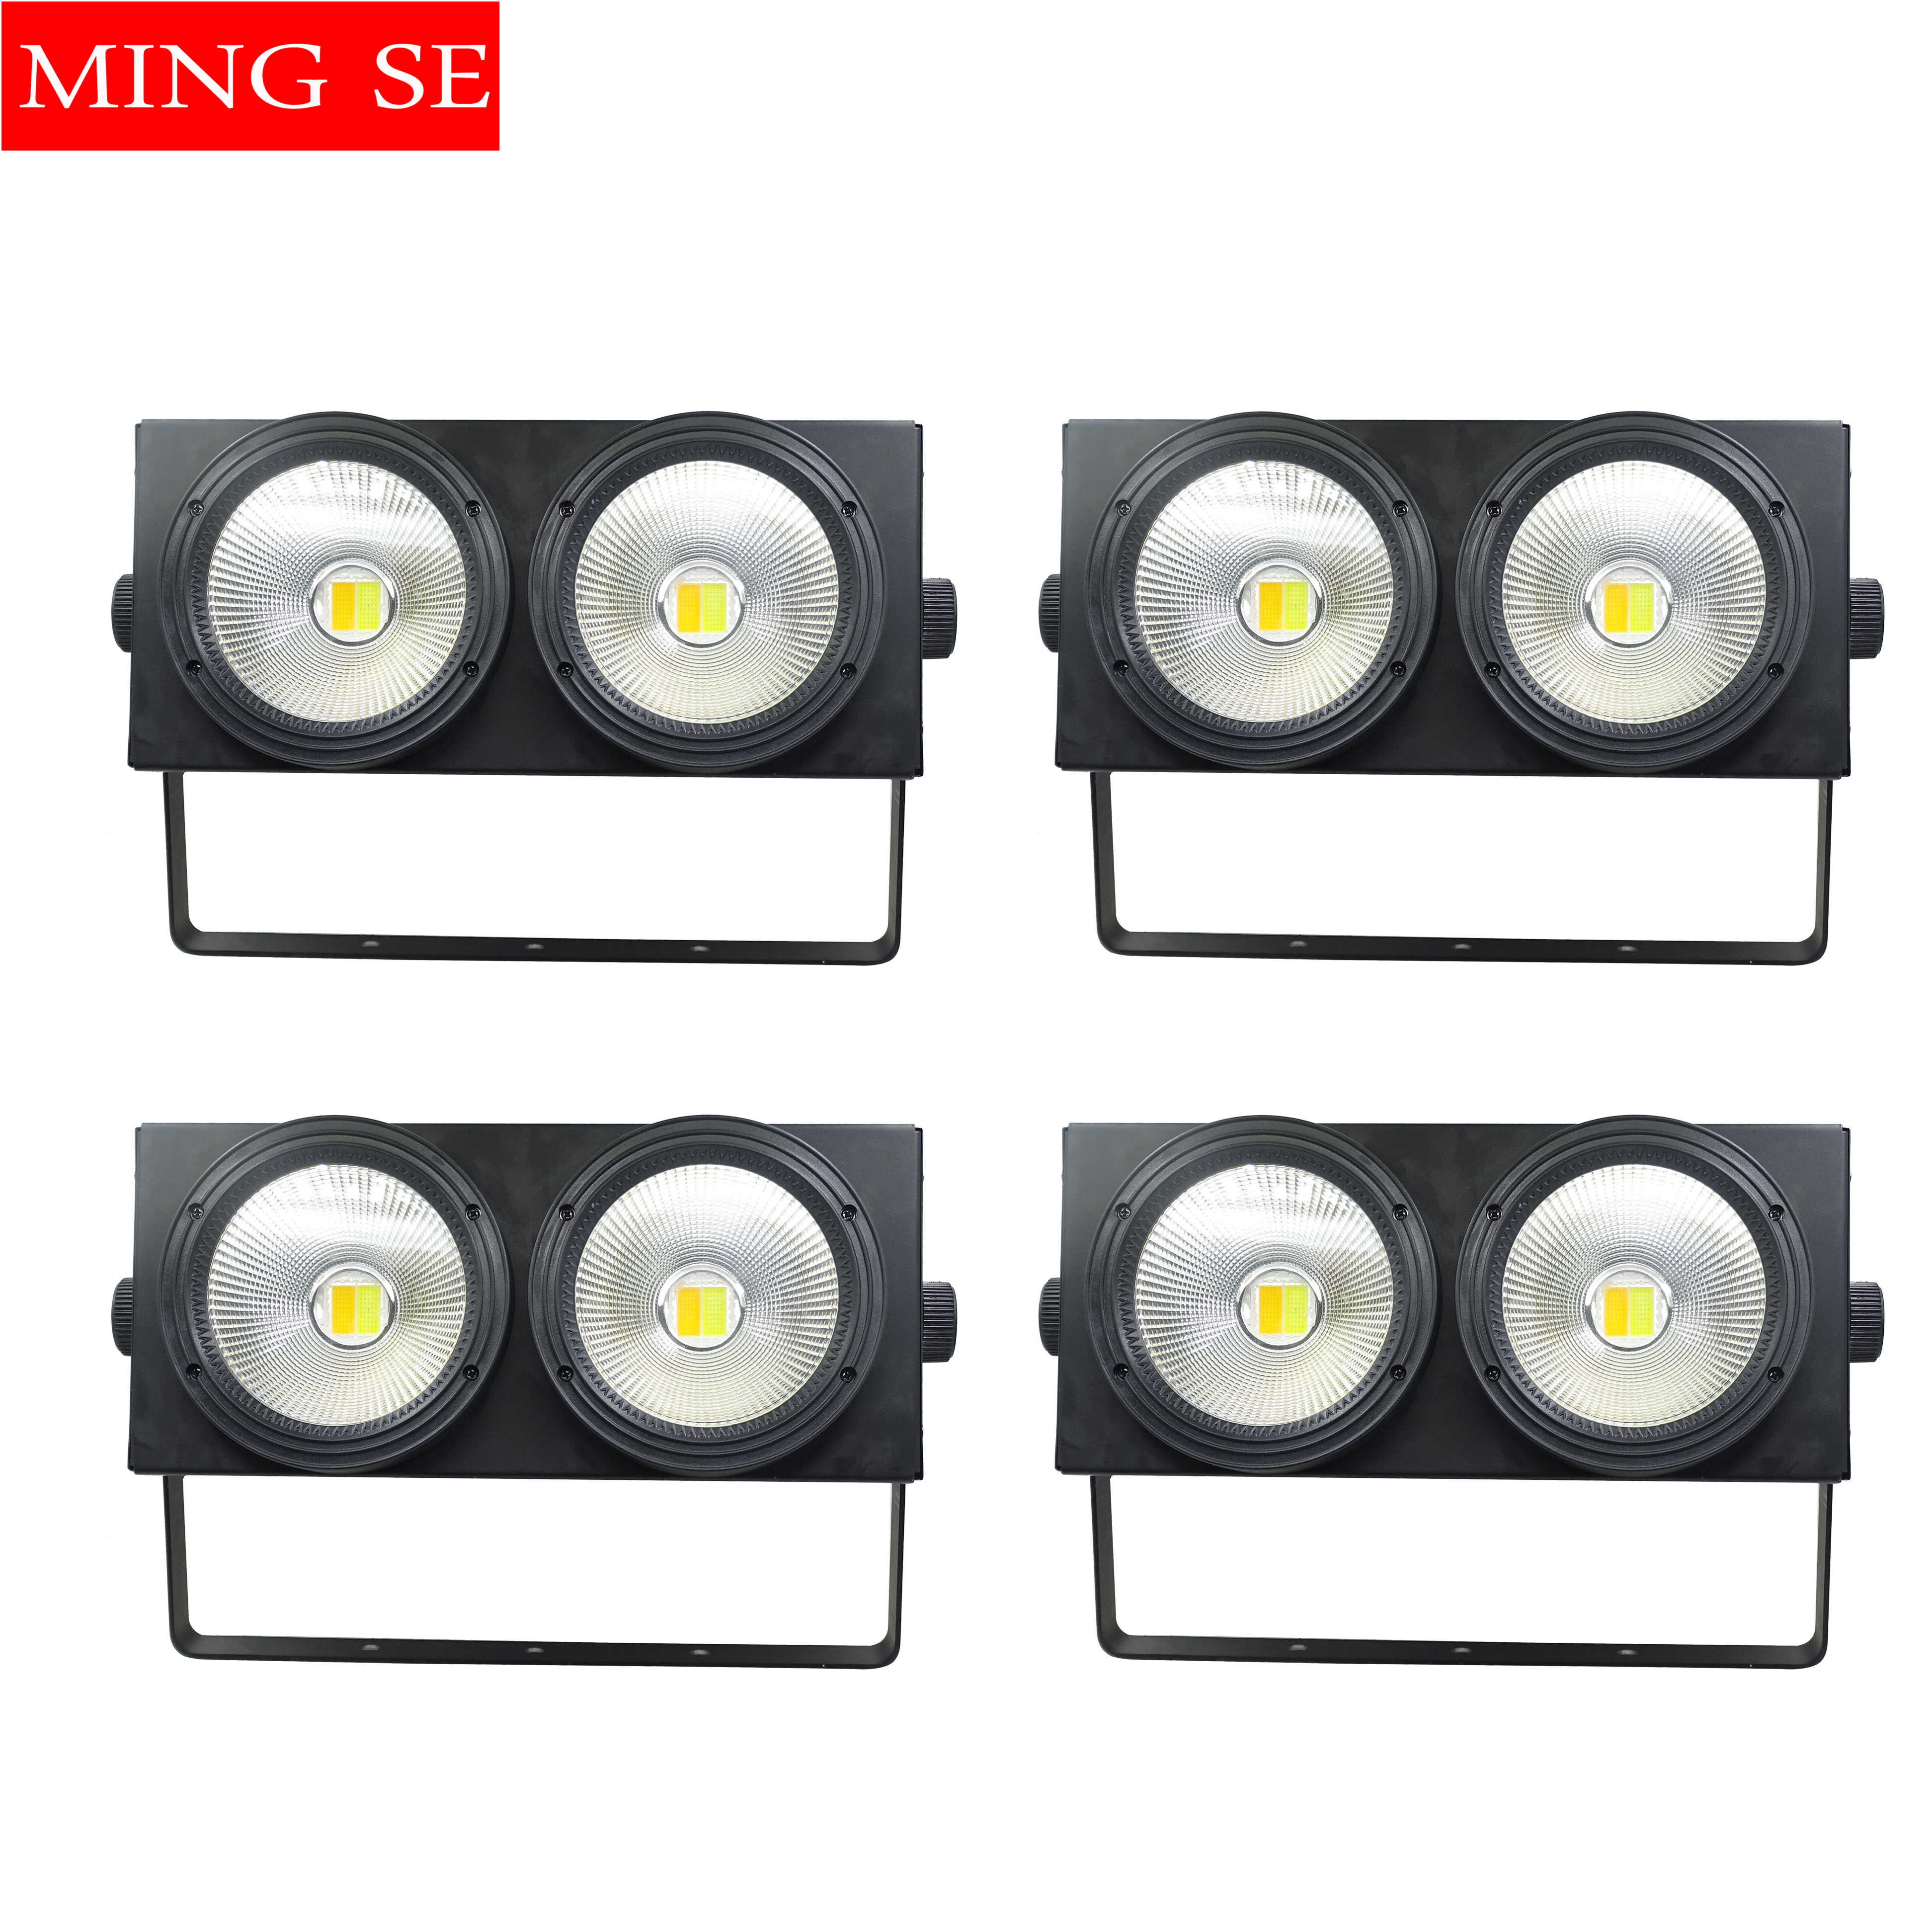 4pcs/lots 2 Eyes LED COB Blinder Light Cold White/Warm White 2in1 COB LEDs Control Optional Individually 2x100W Audience Light